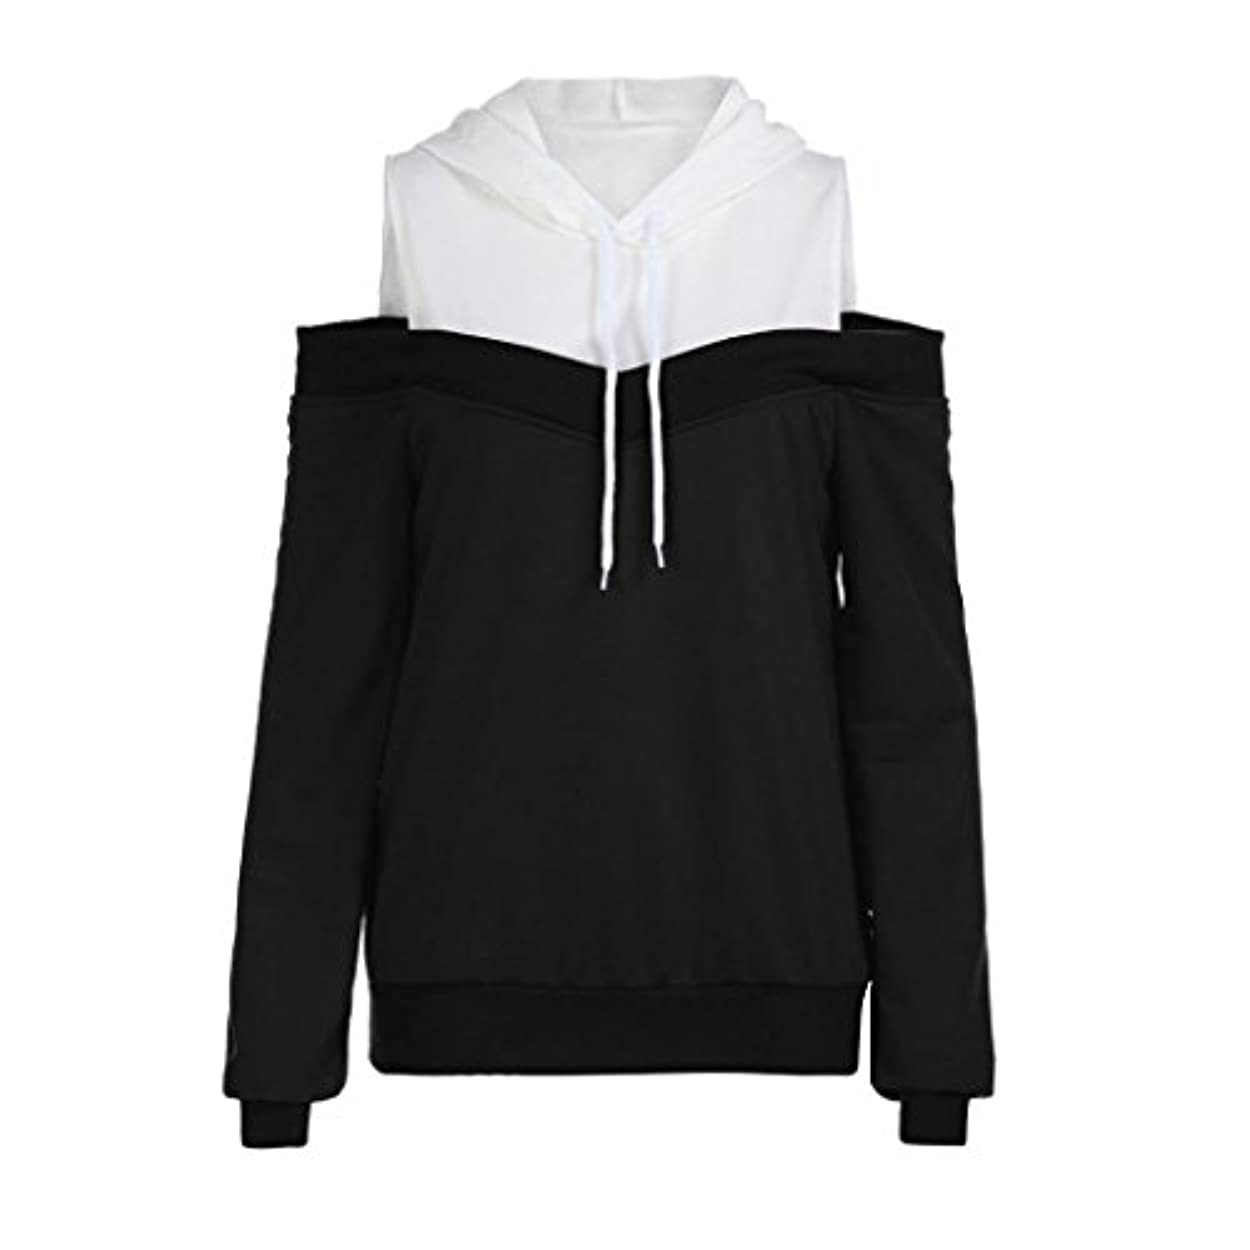 SakuraBest レディースファッションオフショルダーロングスリーブパーカースウェットシャツ